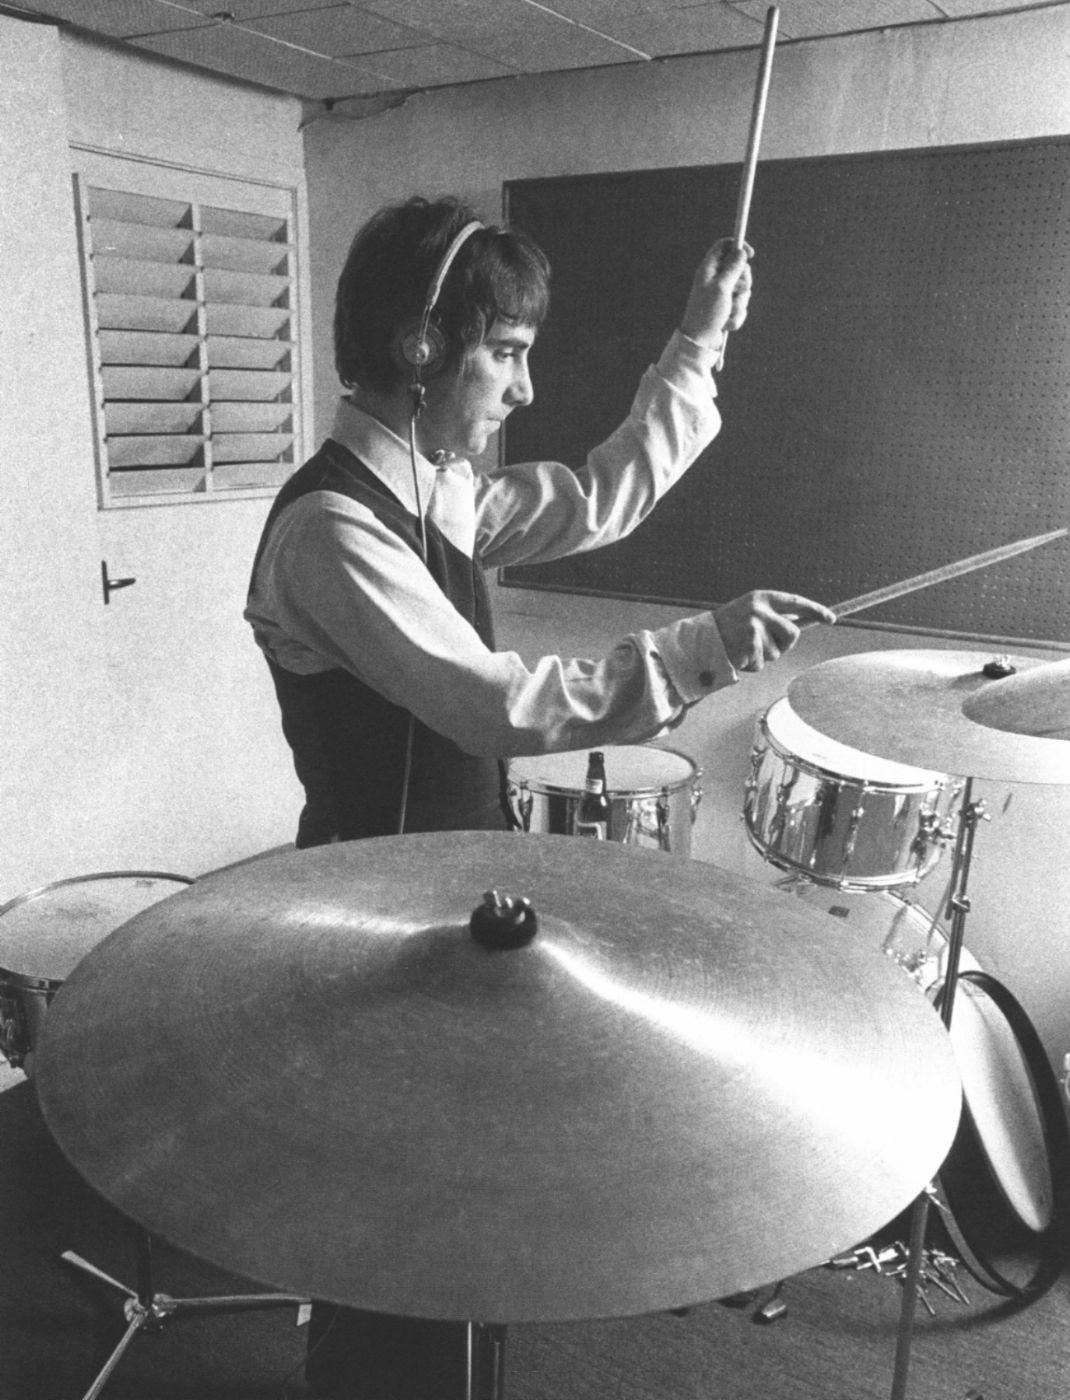 f3c74d3daa1e9 Keith Moon - 1969.